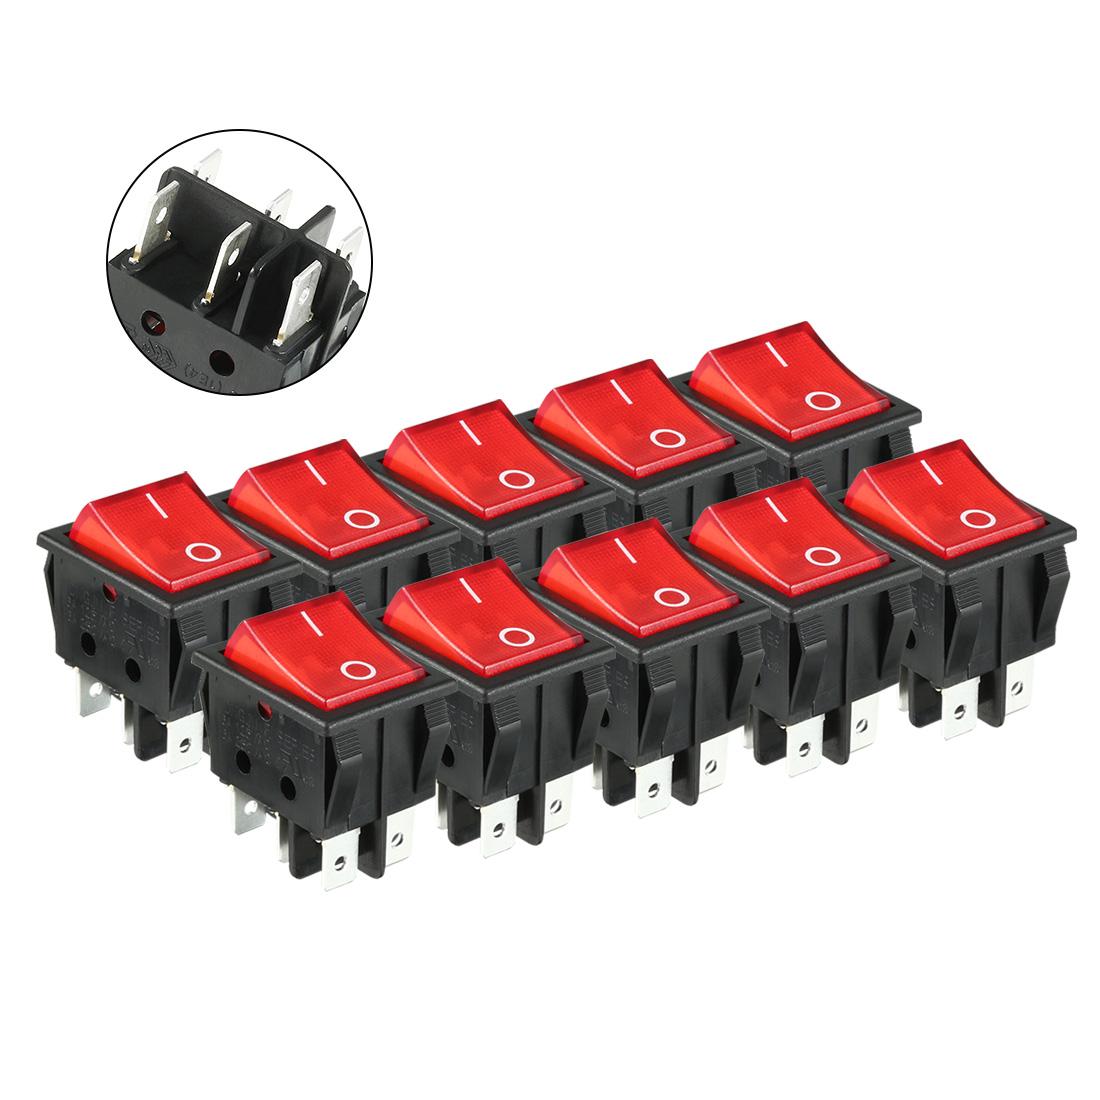 10pcs AC 250V/125V 16A On/Off DPDT Rocker Switch Latching Red Light